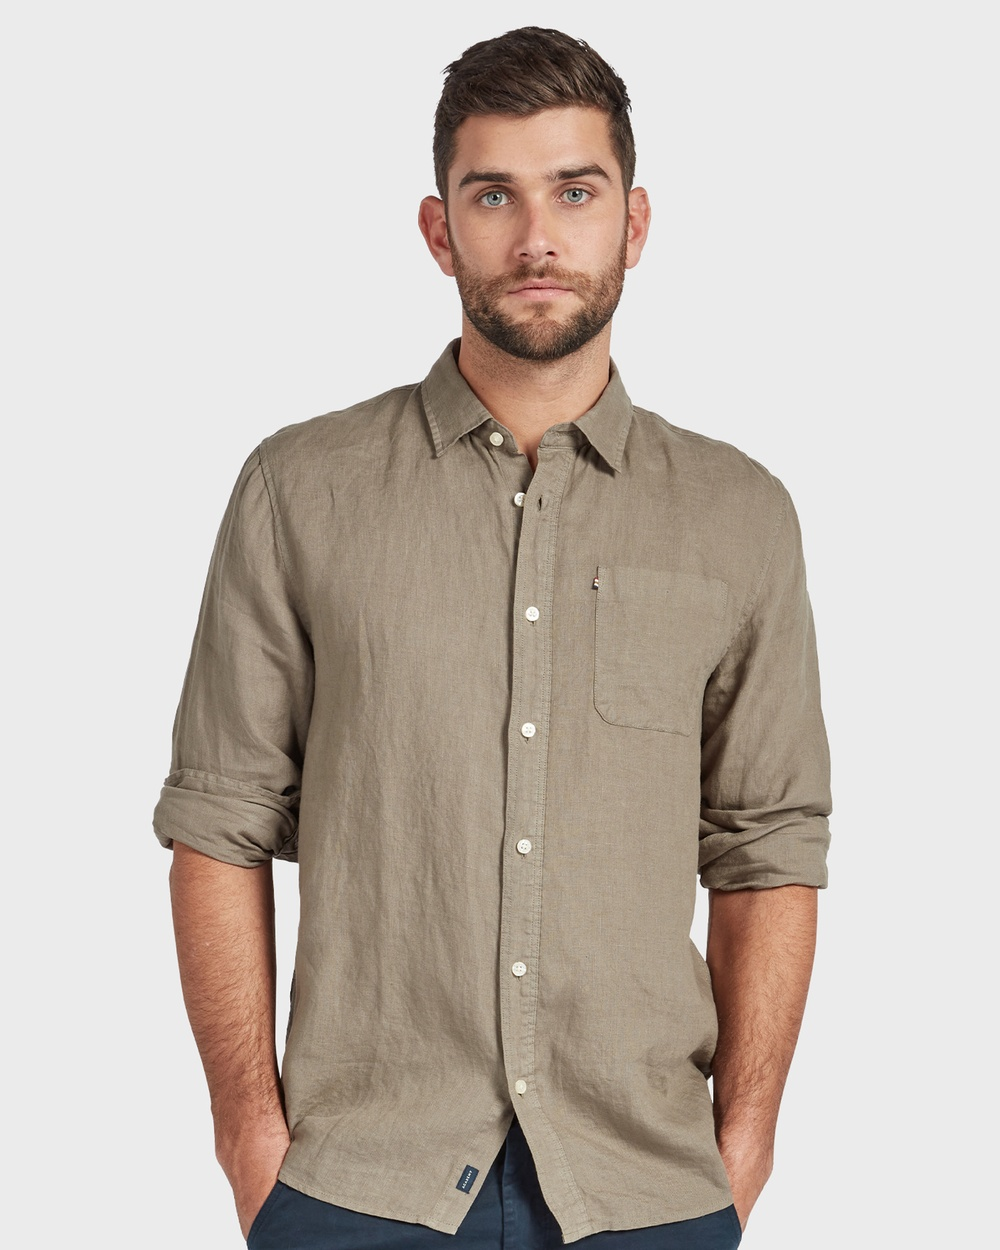 Academy Brand Hampton L S Linen Shirt Shirts & Polos Green L-S